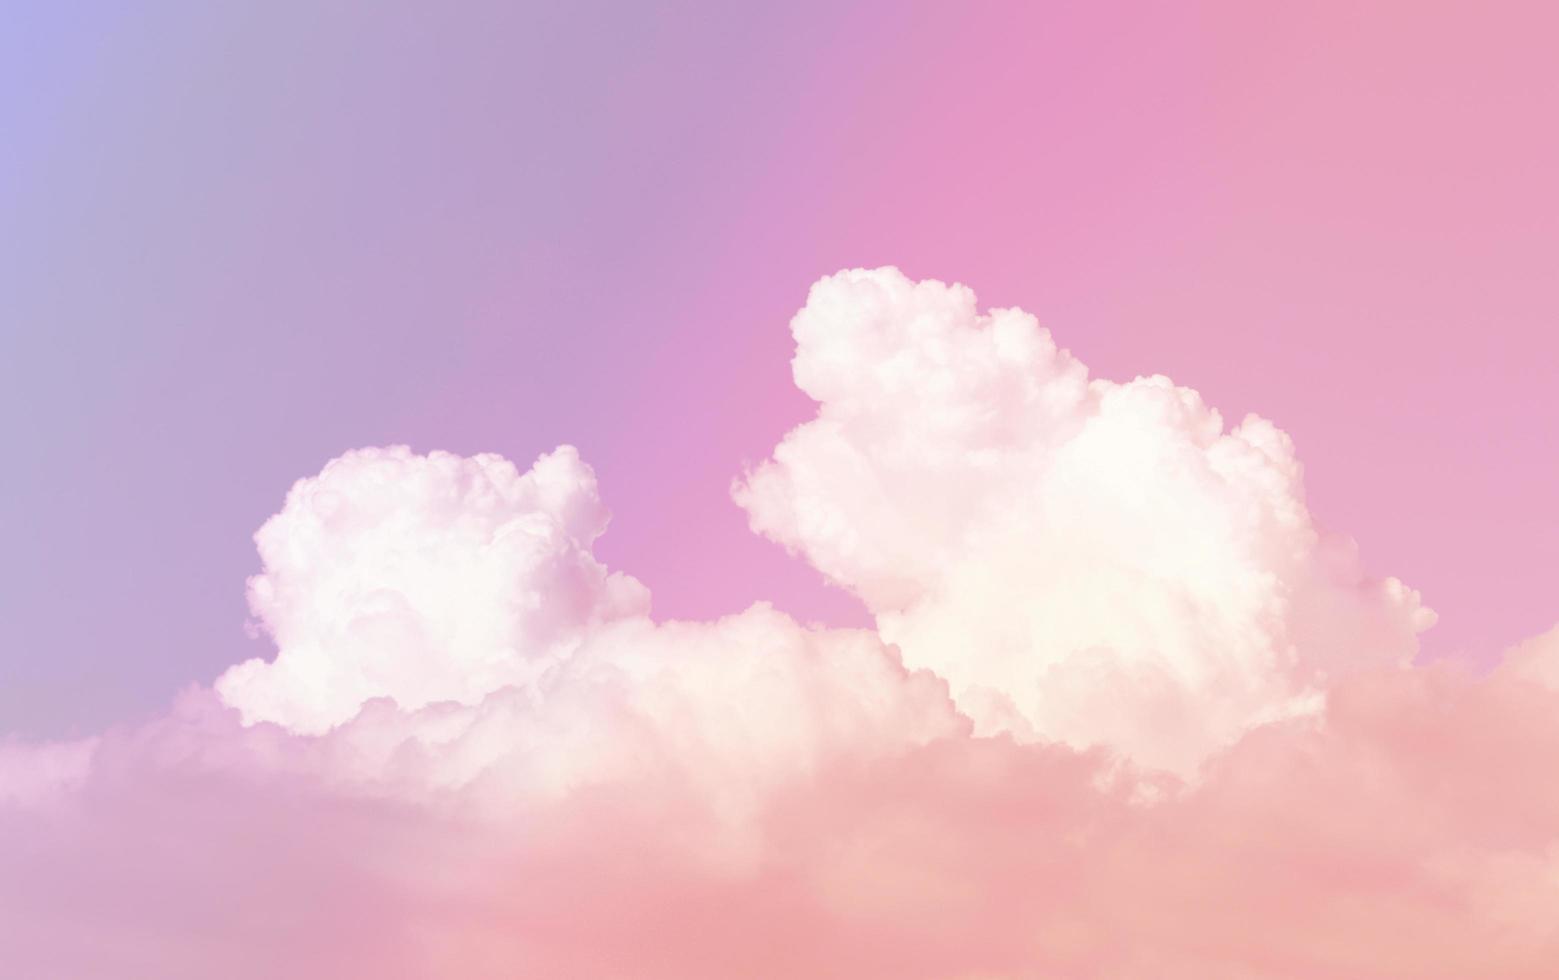 Vibrant colorful sky photo